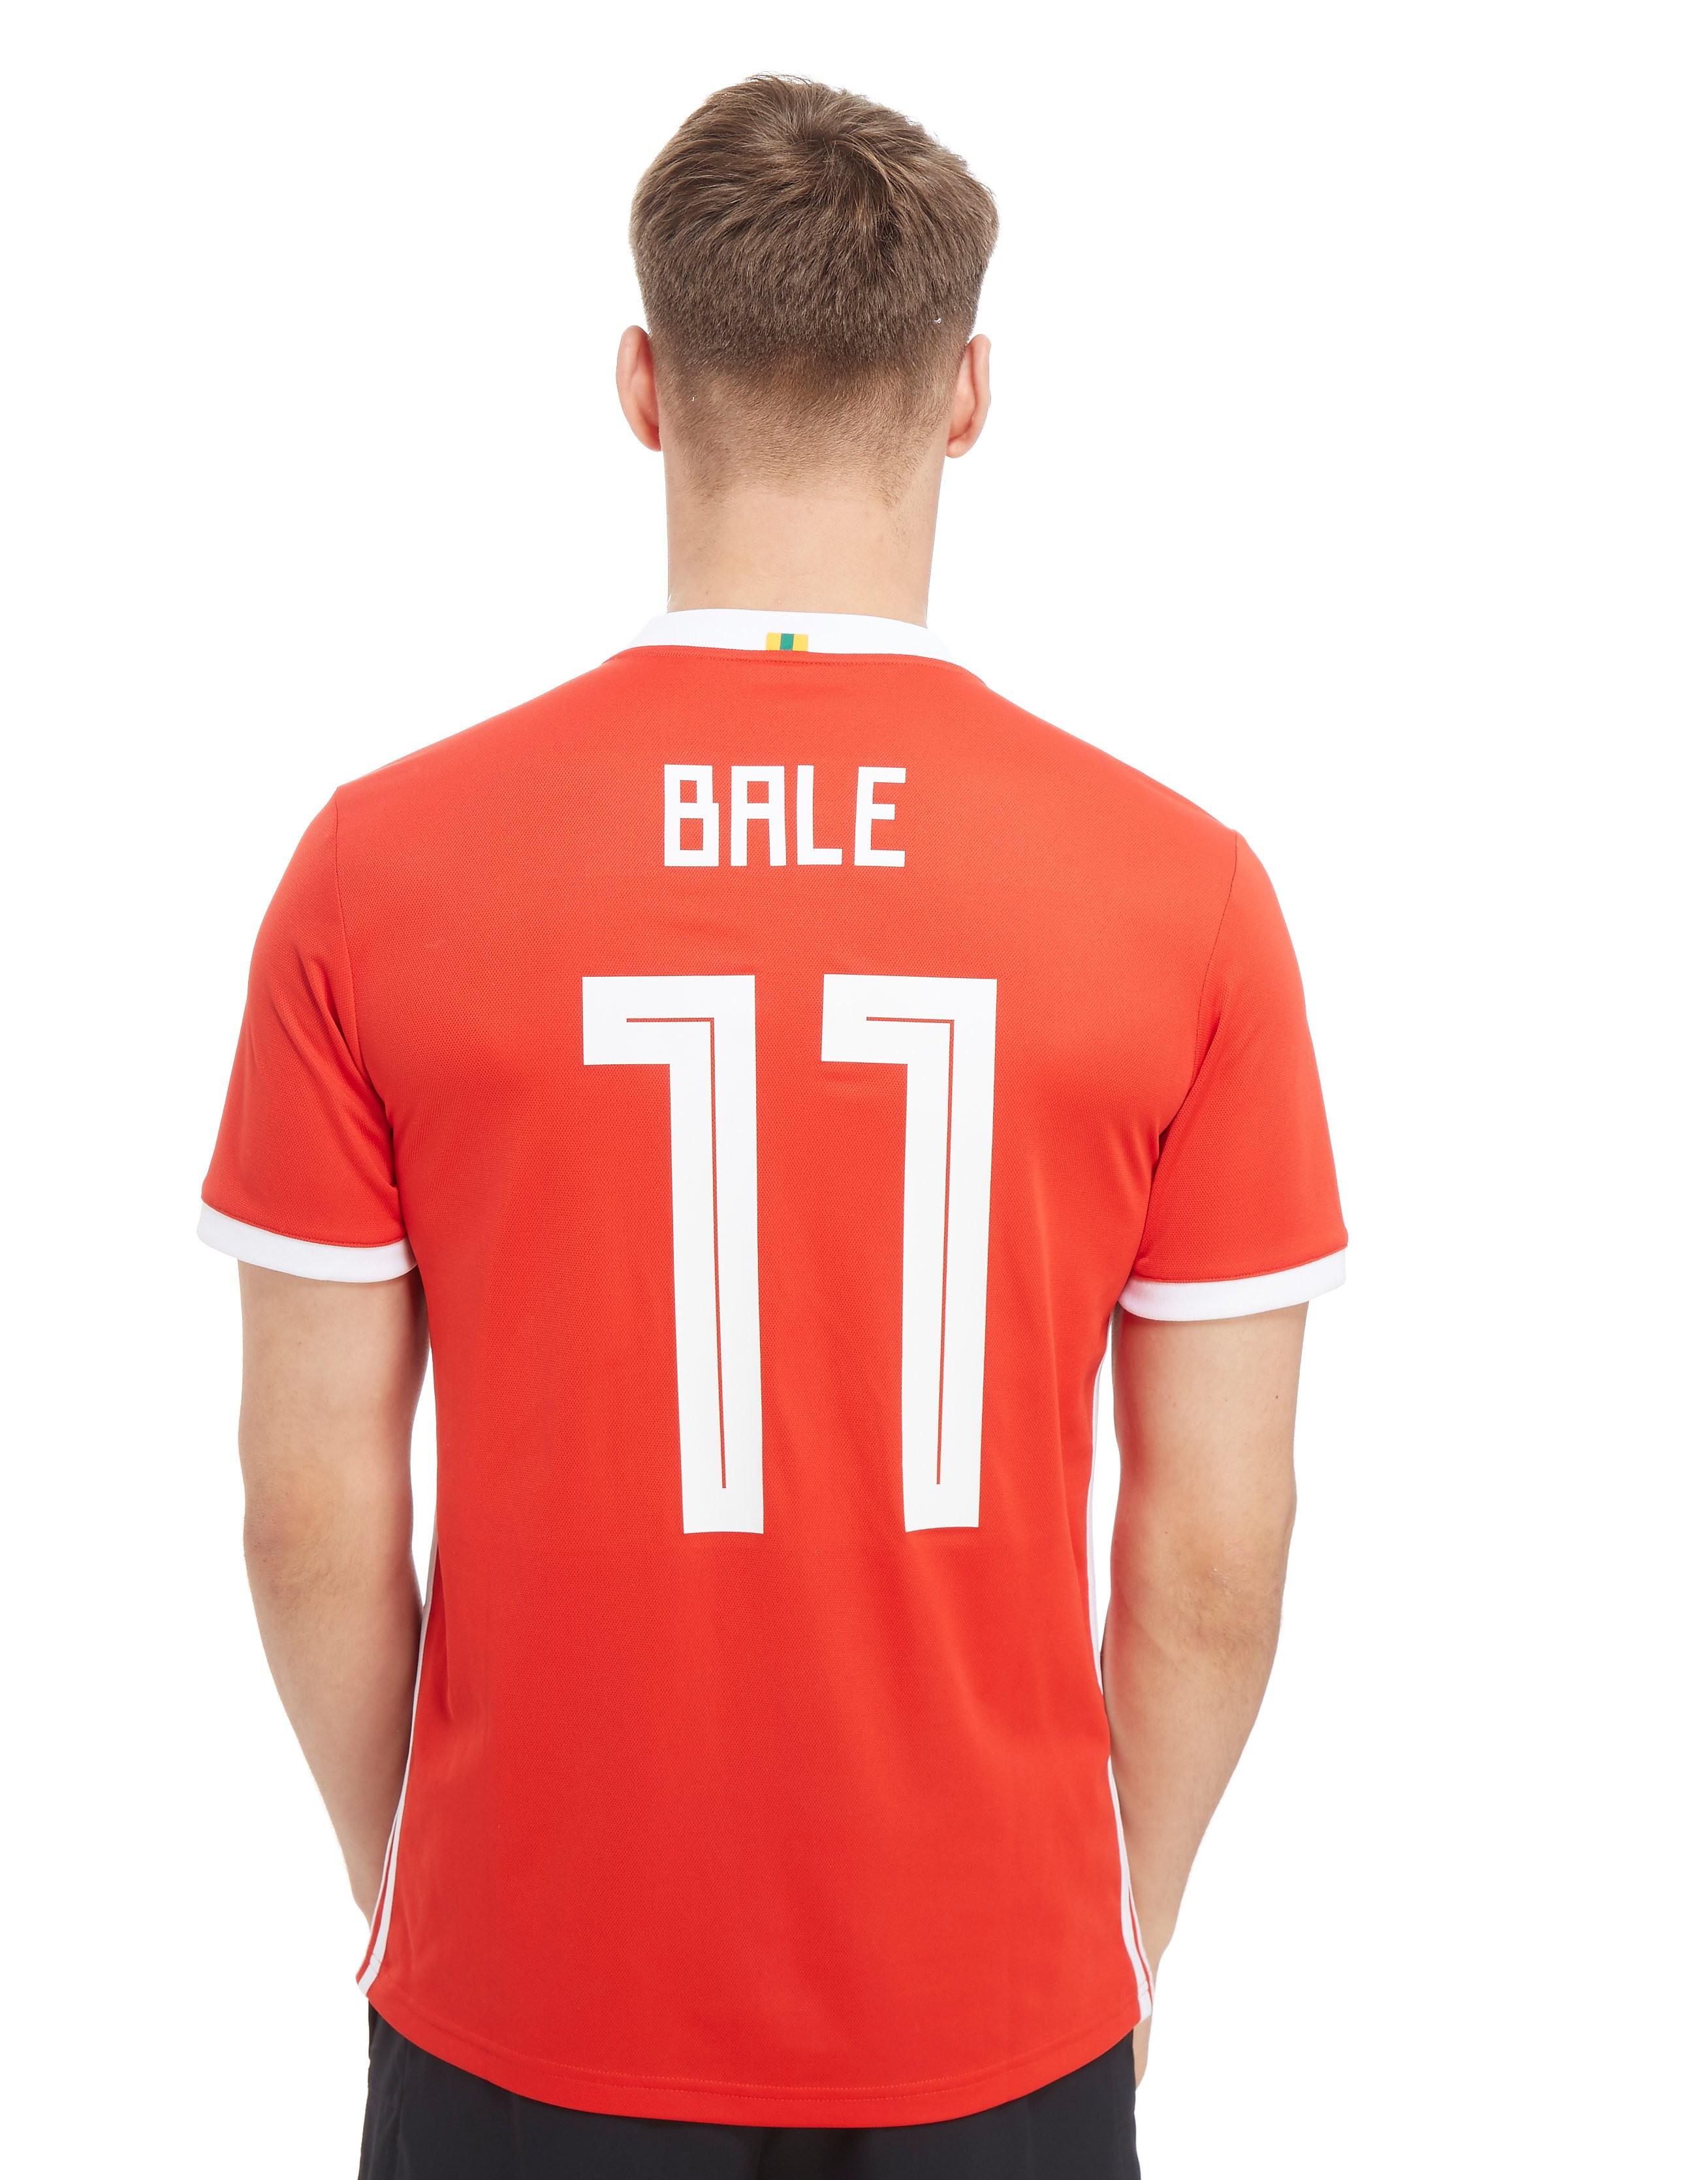 adidas Wales 2018 Home #11 Bale Shirt - Rood - Heren